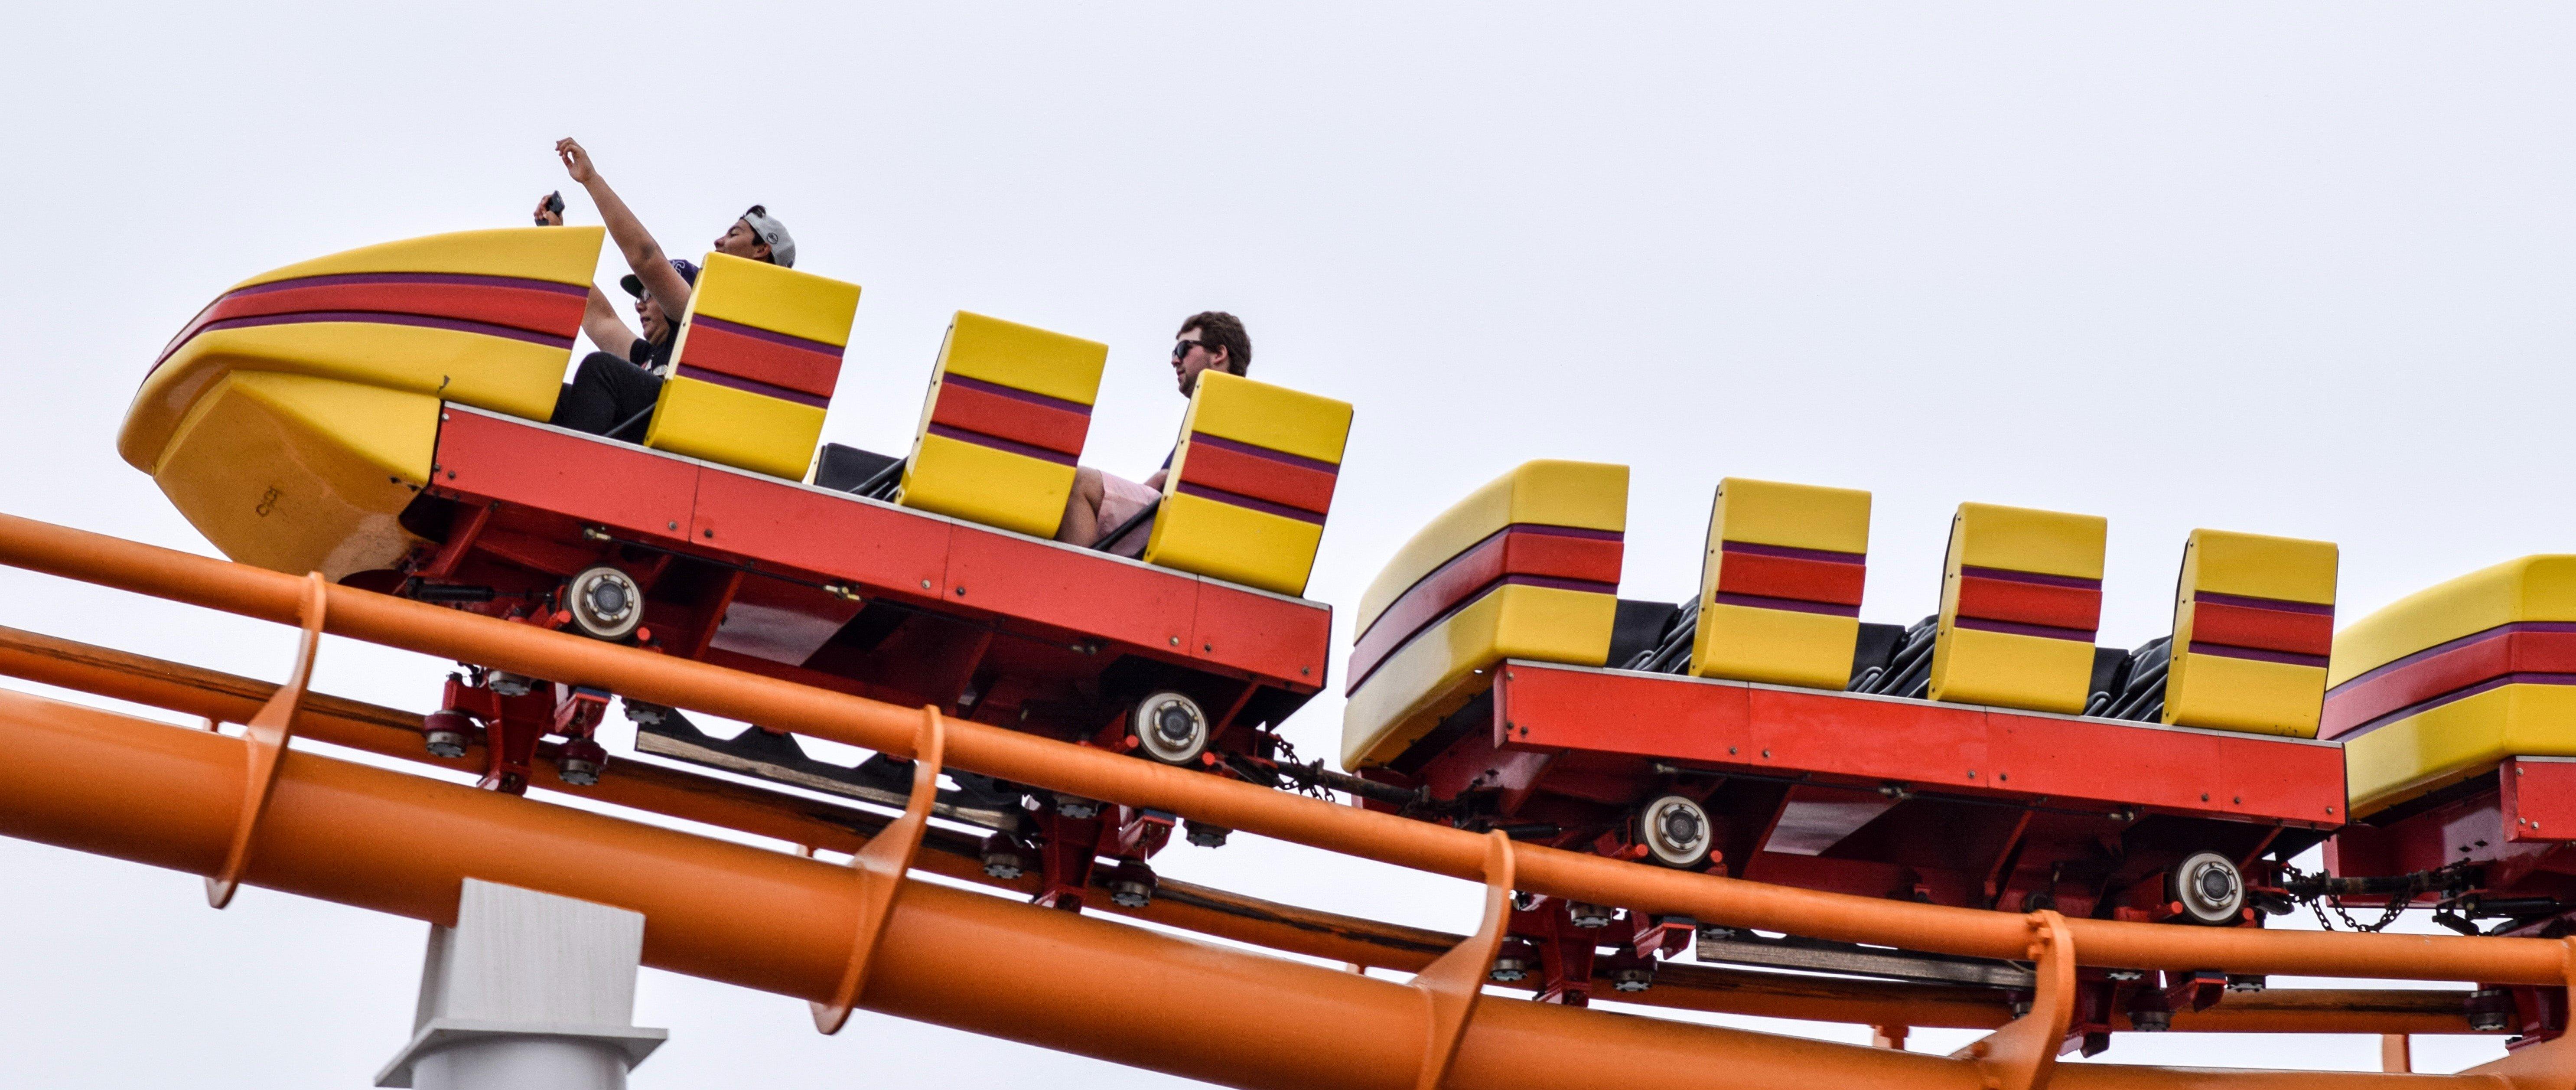 rollercoaster banner - bradley-Ms6GKIS94Yc-unsplash